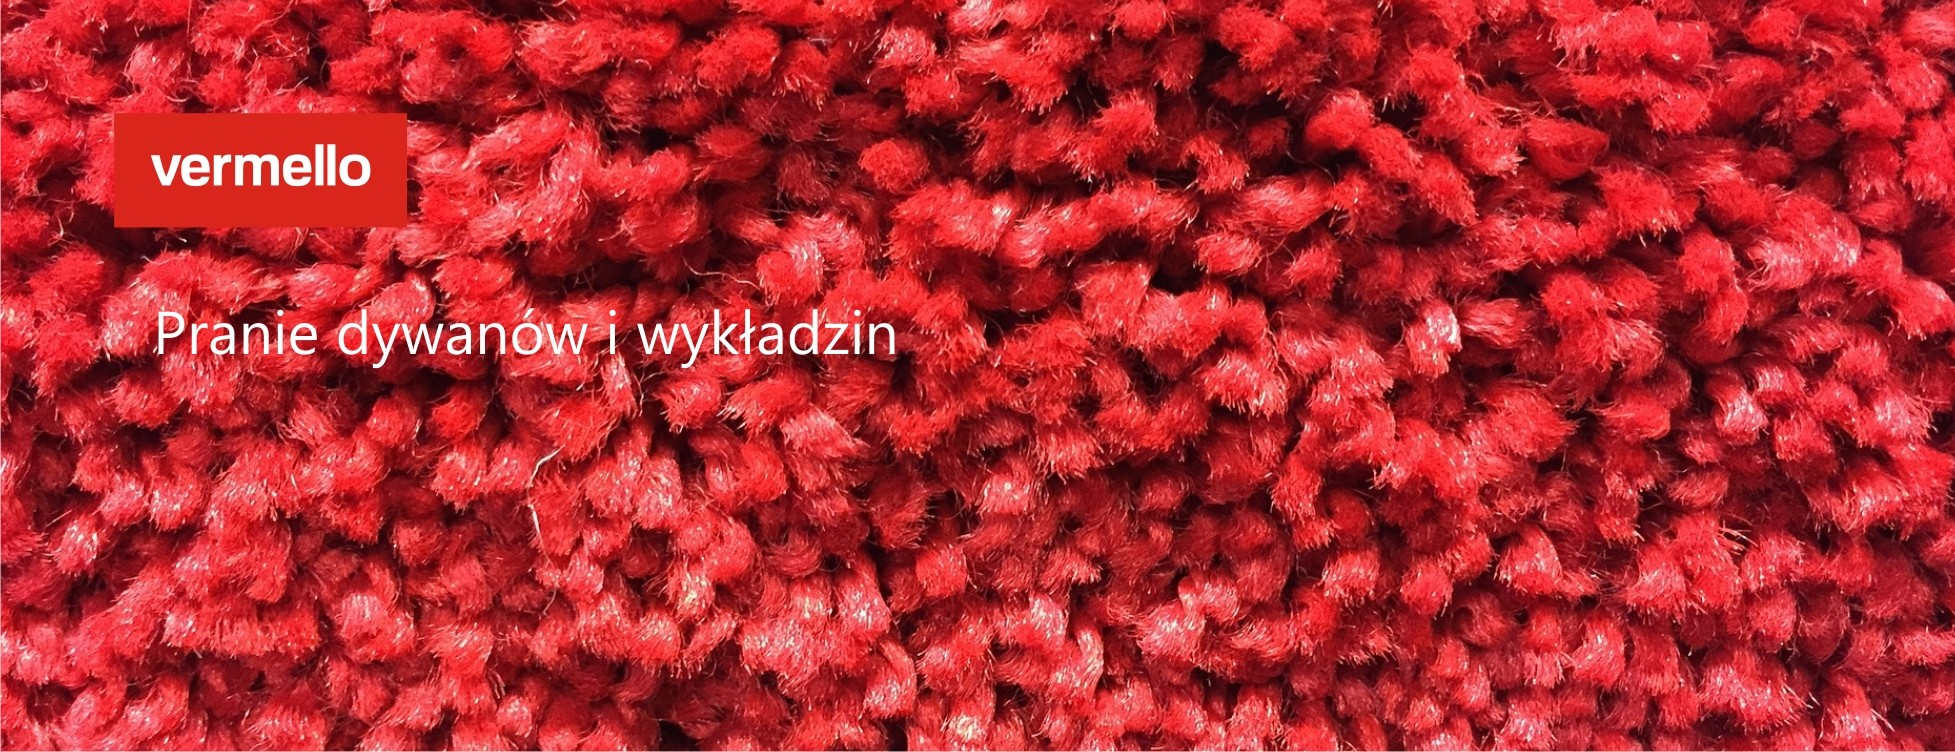 vermello.pl